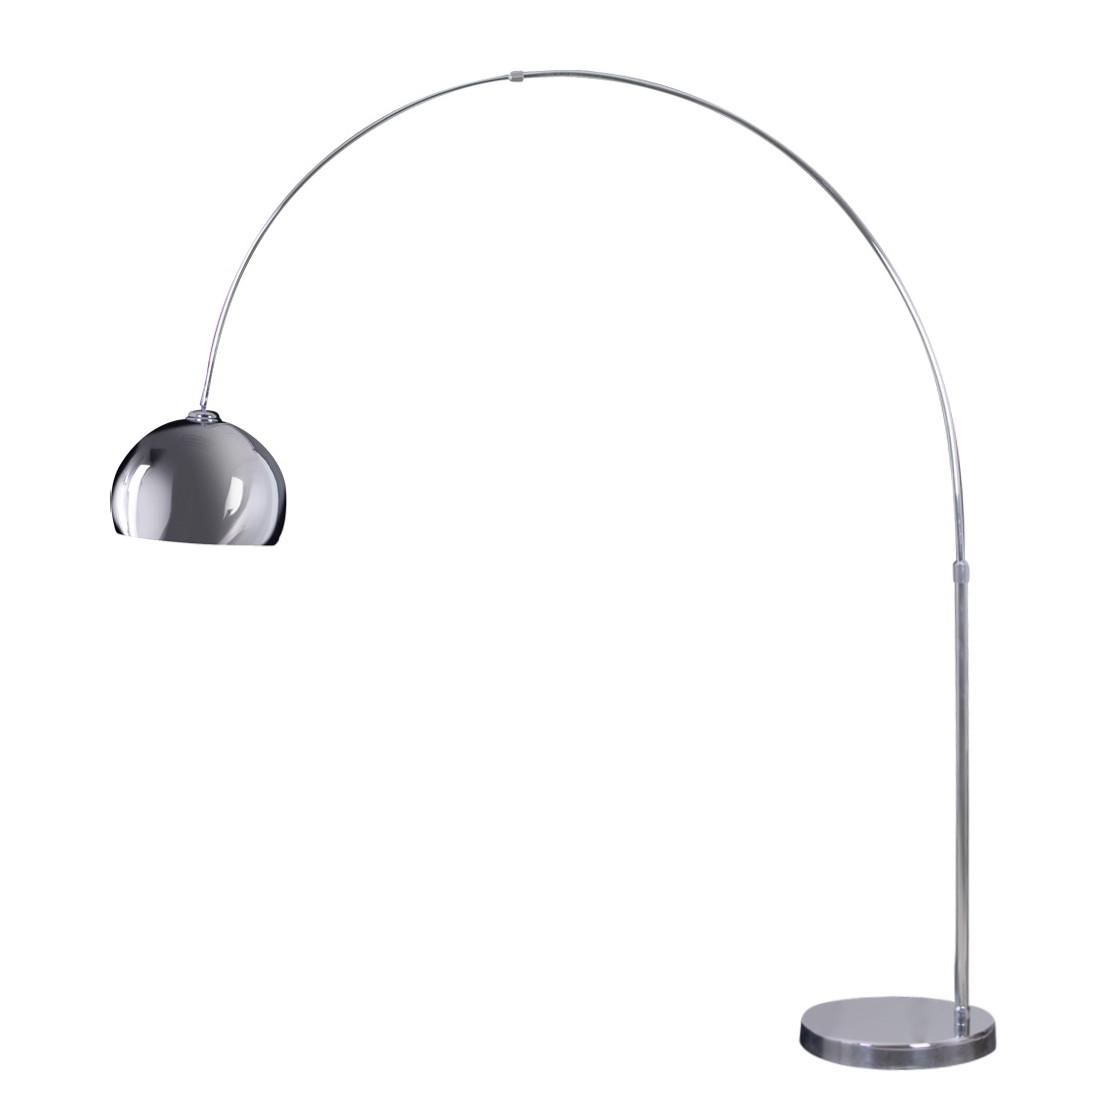 EEK A++, Lampadaire Arcata I - Métal - 1 ampoule, Loistaa